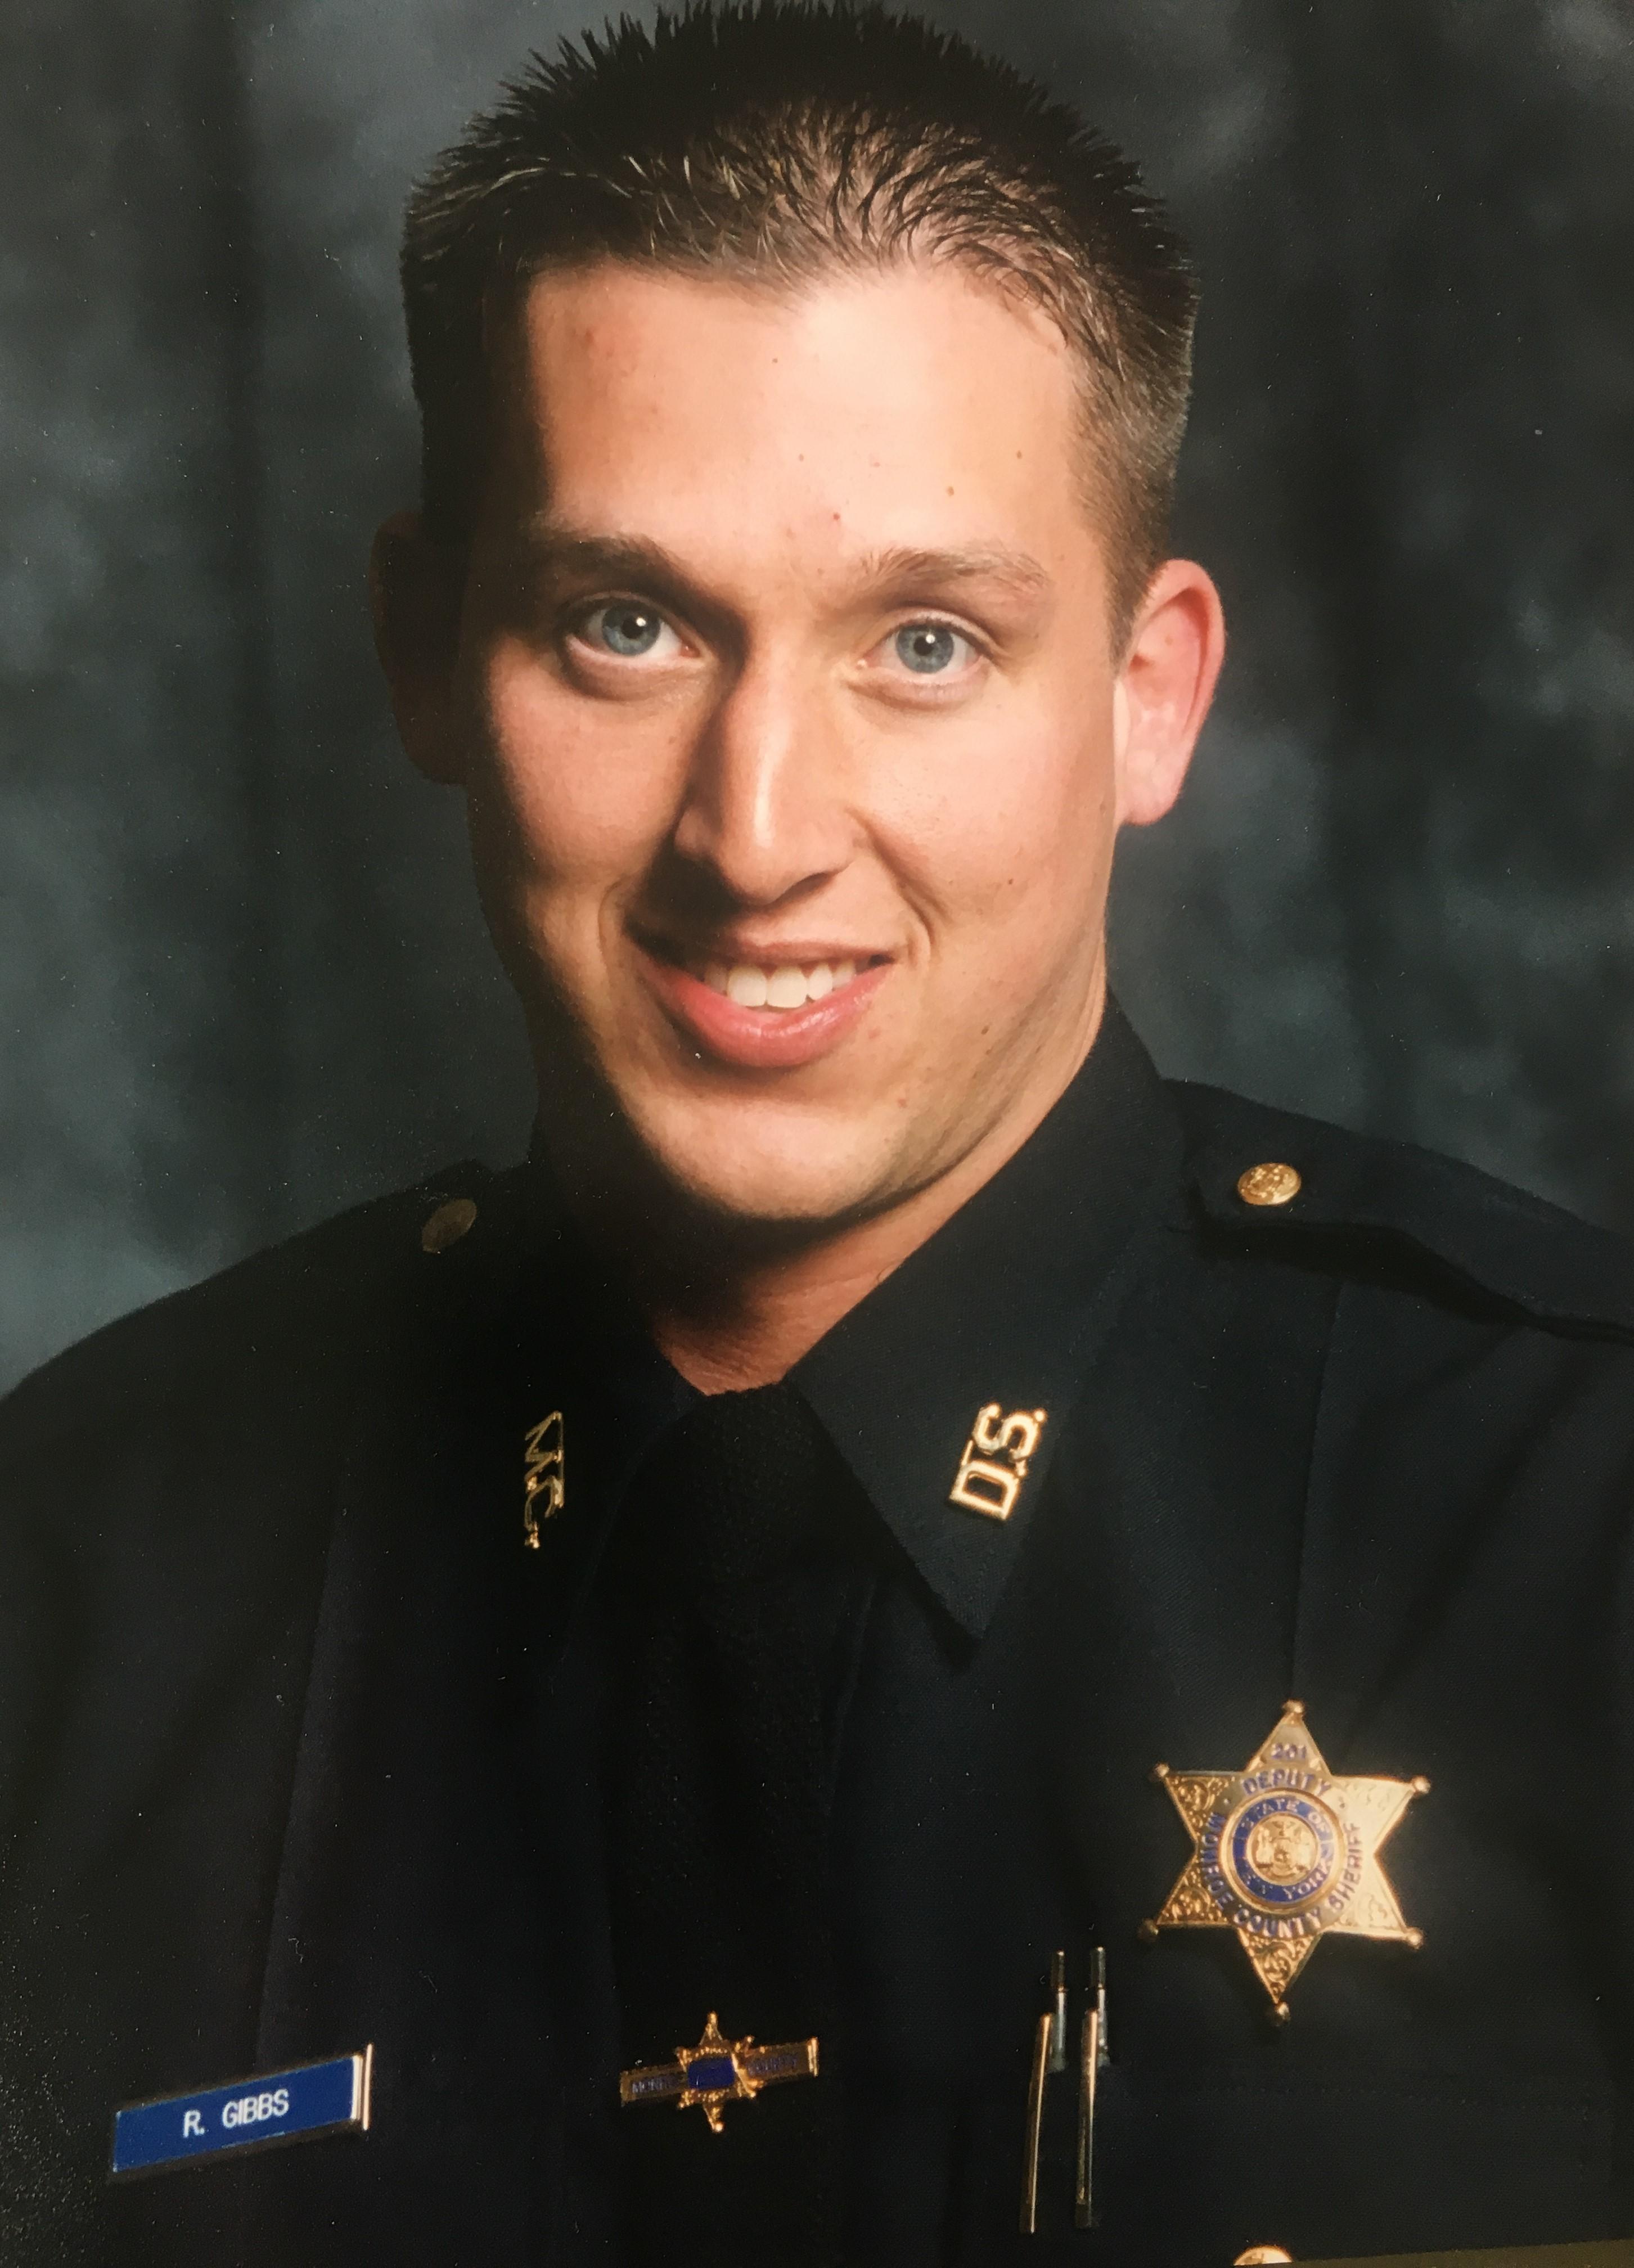 Ryan J. Gibbs